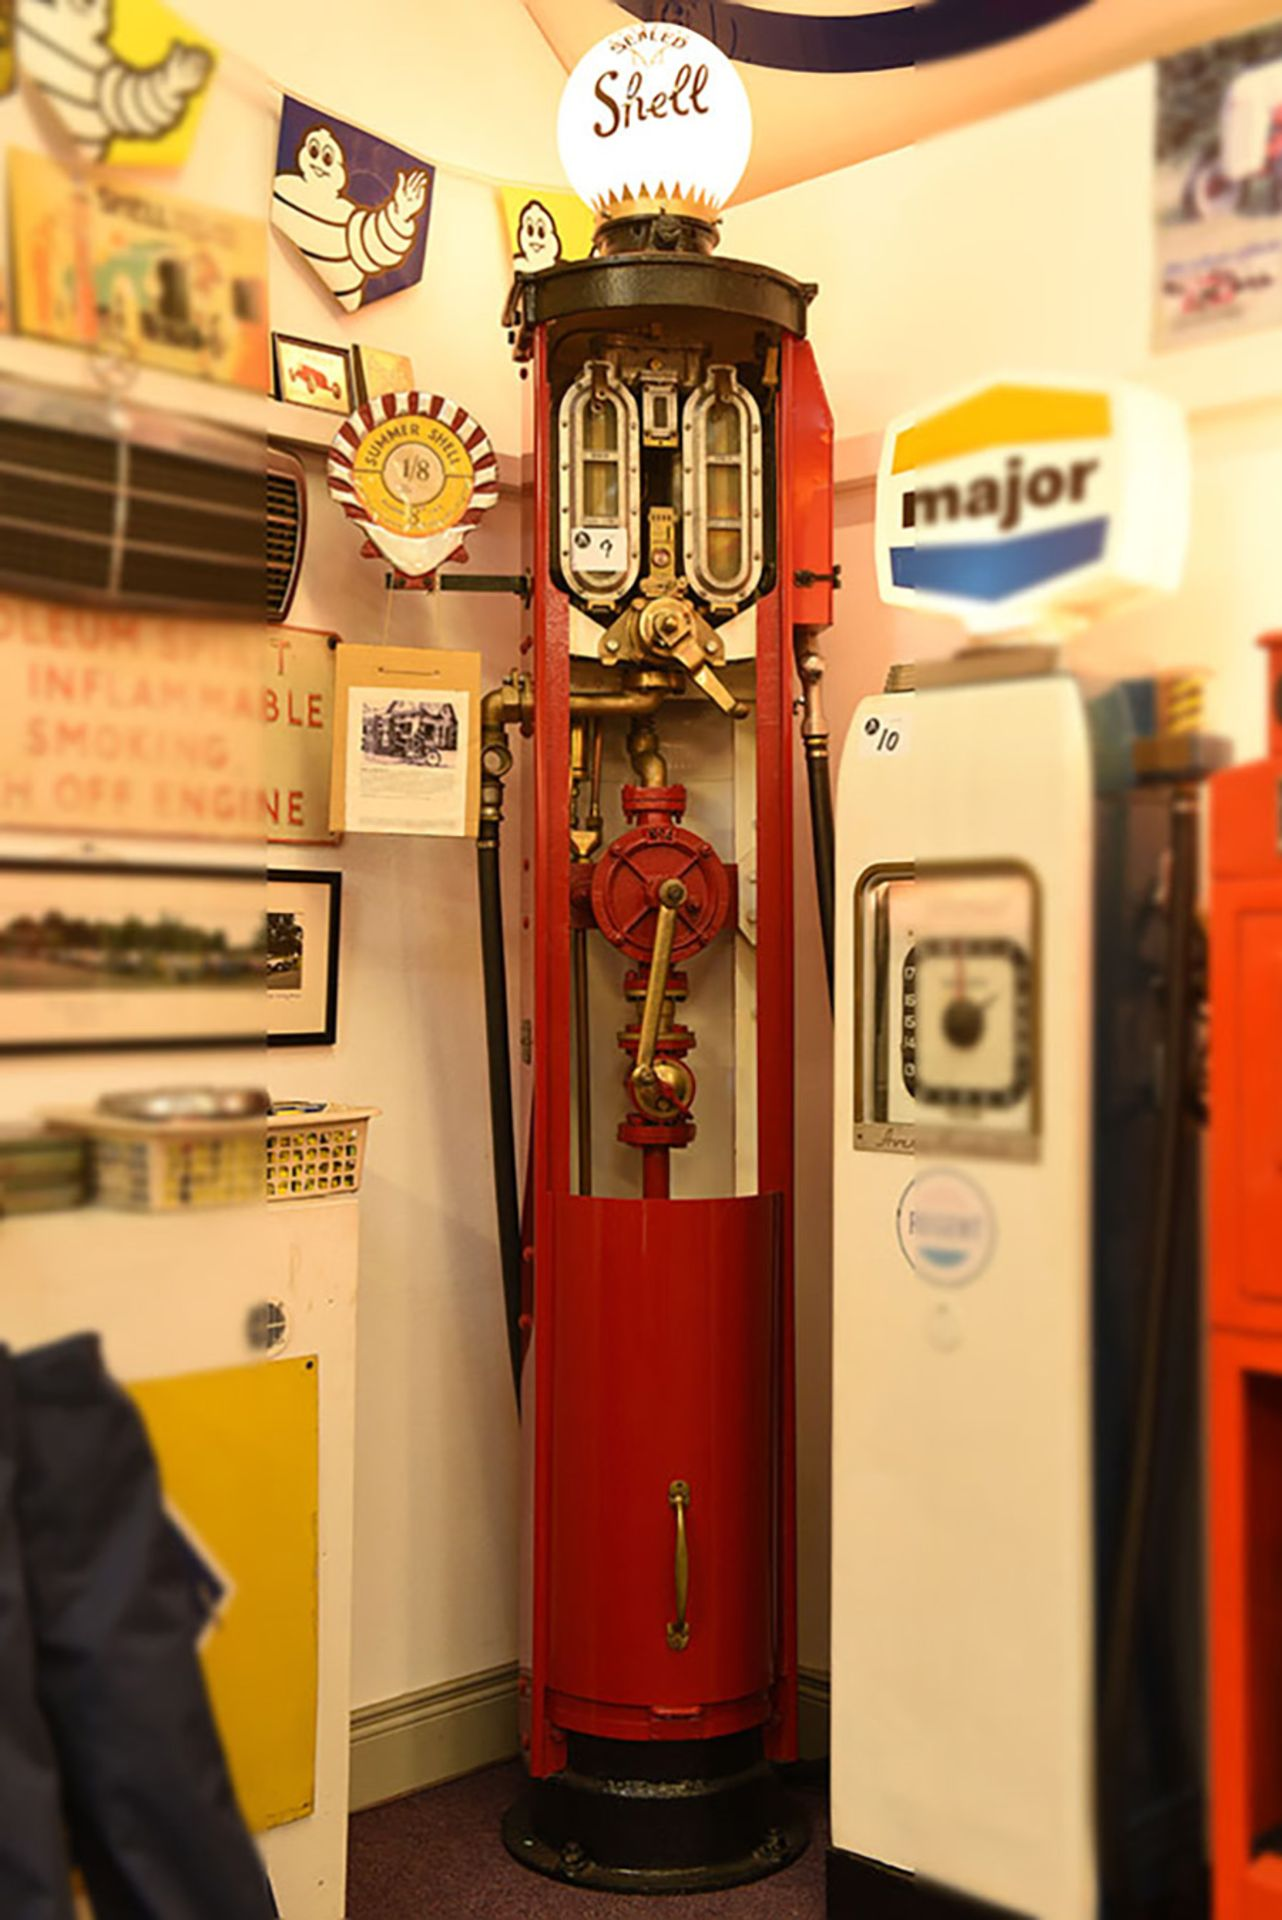 Lot 9 - 1925 hand operated Shell petrol pump c/w glass globe